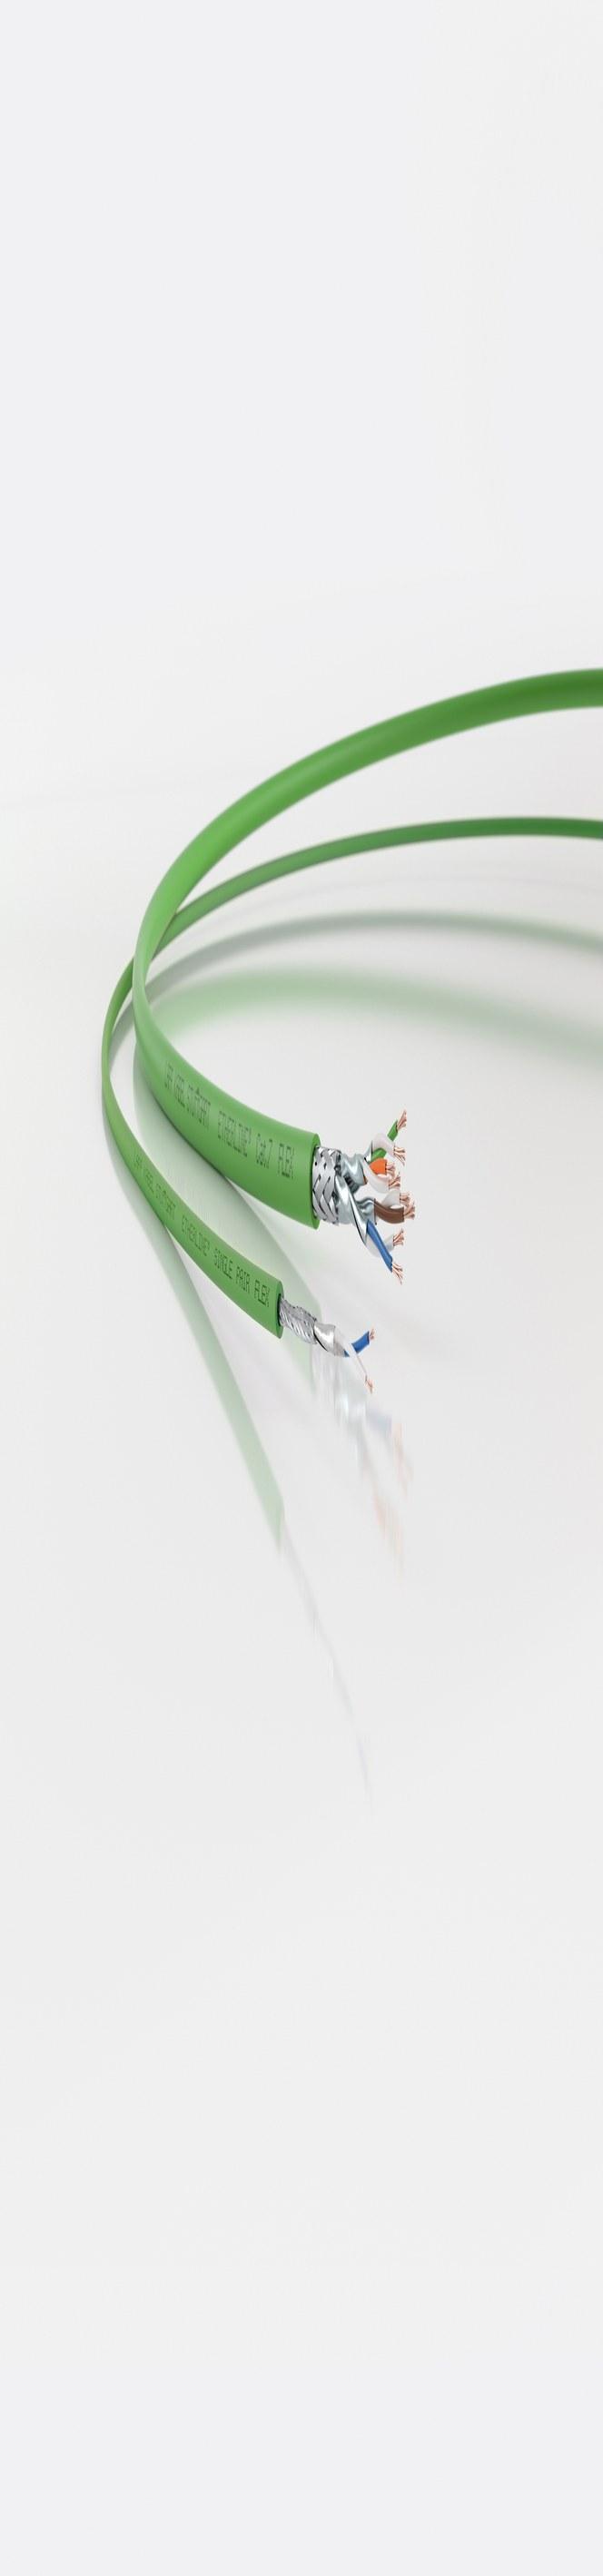 Замість чотирьох пар - кабелі Ethernet з однією парою